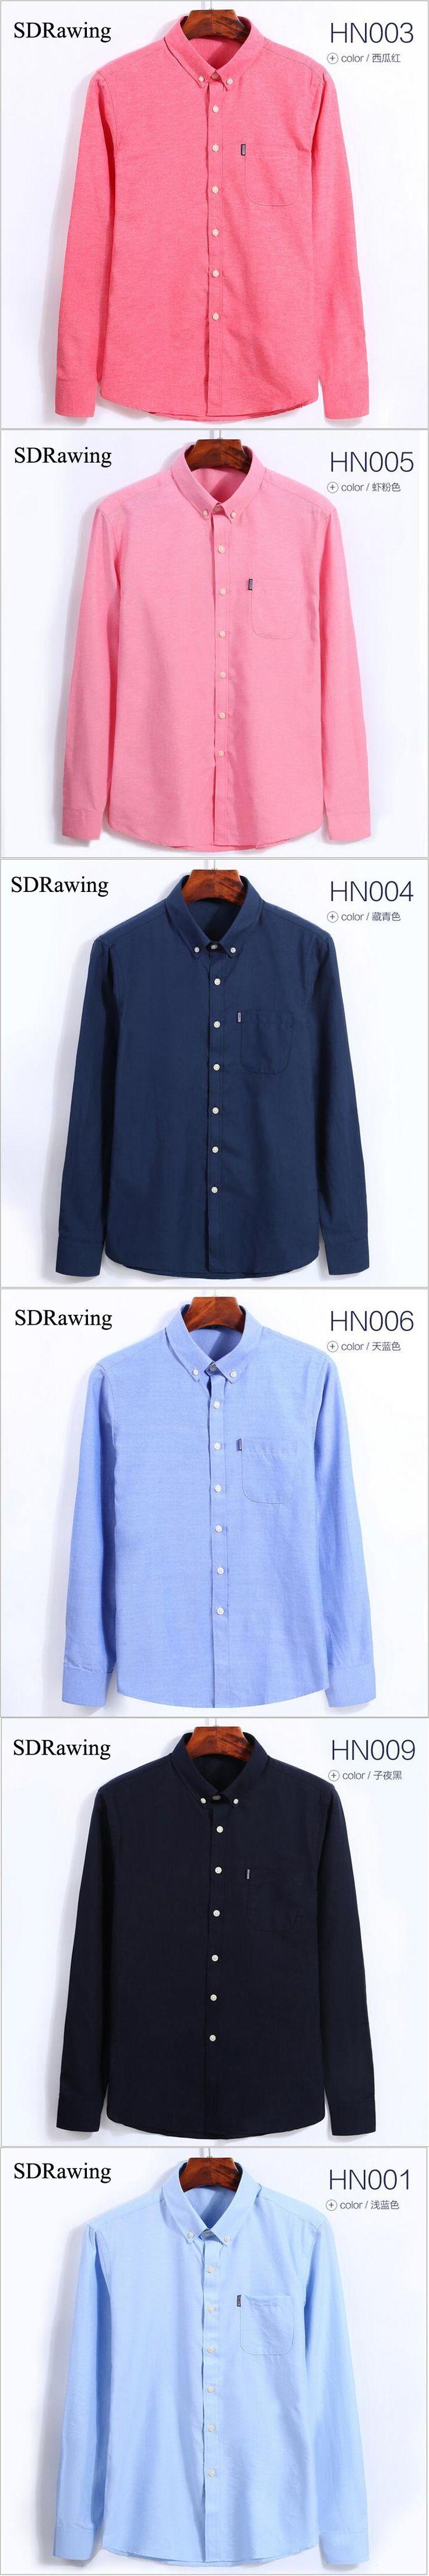 Brand Social Shirts Men Long Sleeve Oxford Shirts Men 2017 Spring Clothing Cotton Blends Business Casual Men Shirts 4XL